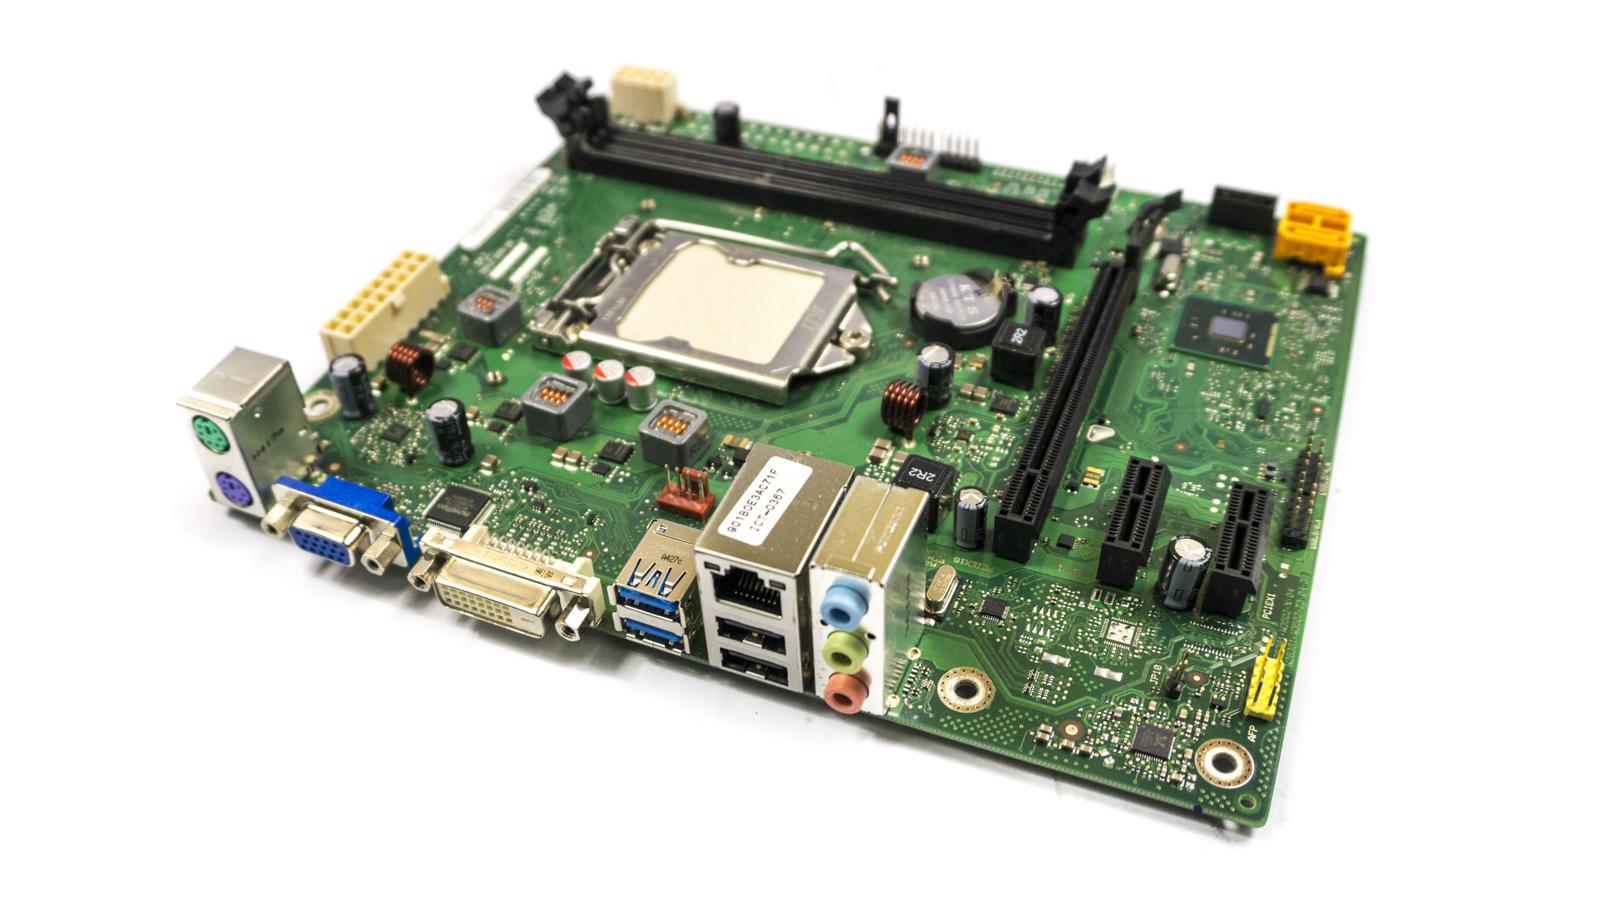 Fujitsu D3230-A13 GS 2 Socket LGA1150 PC Motherboard